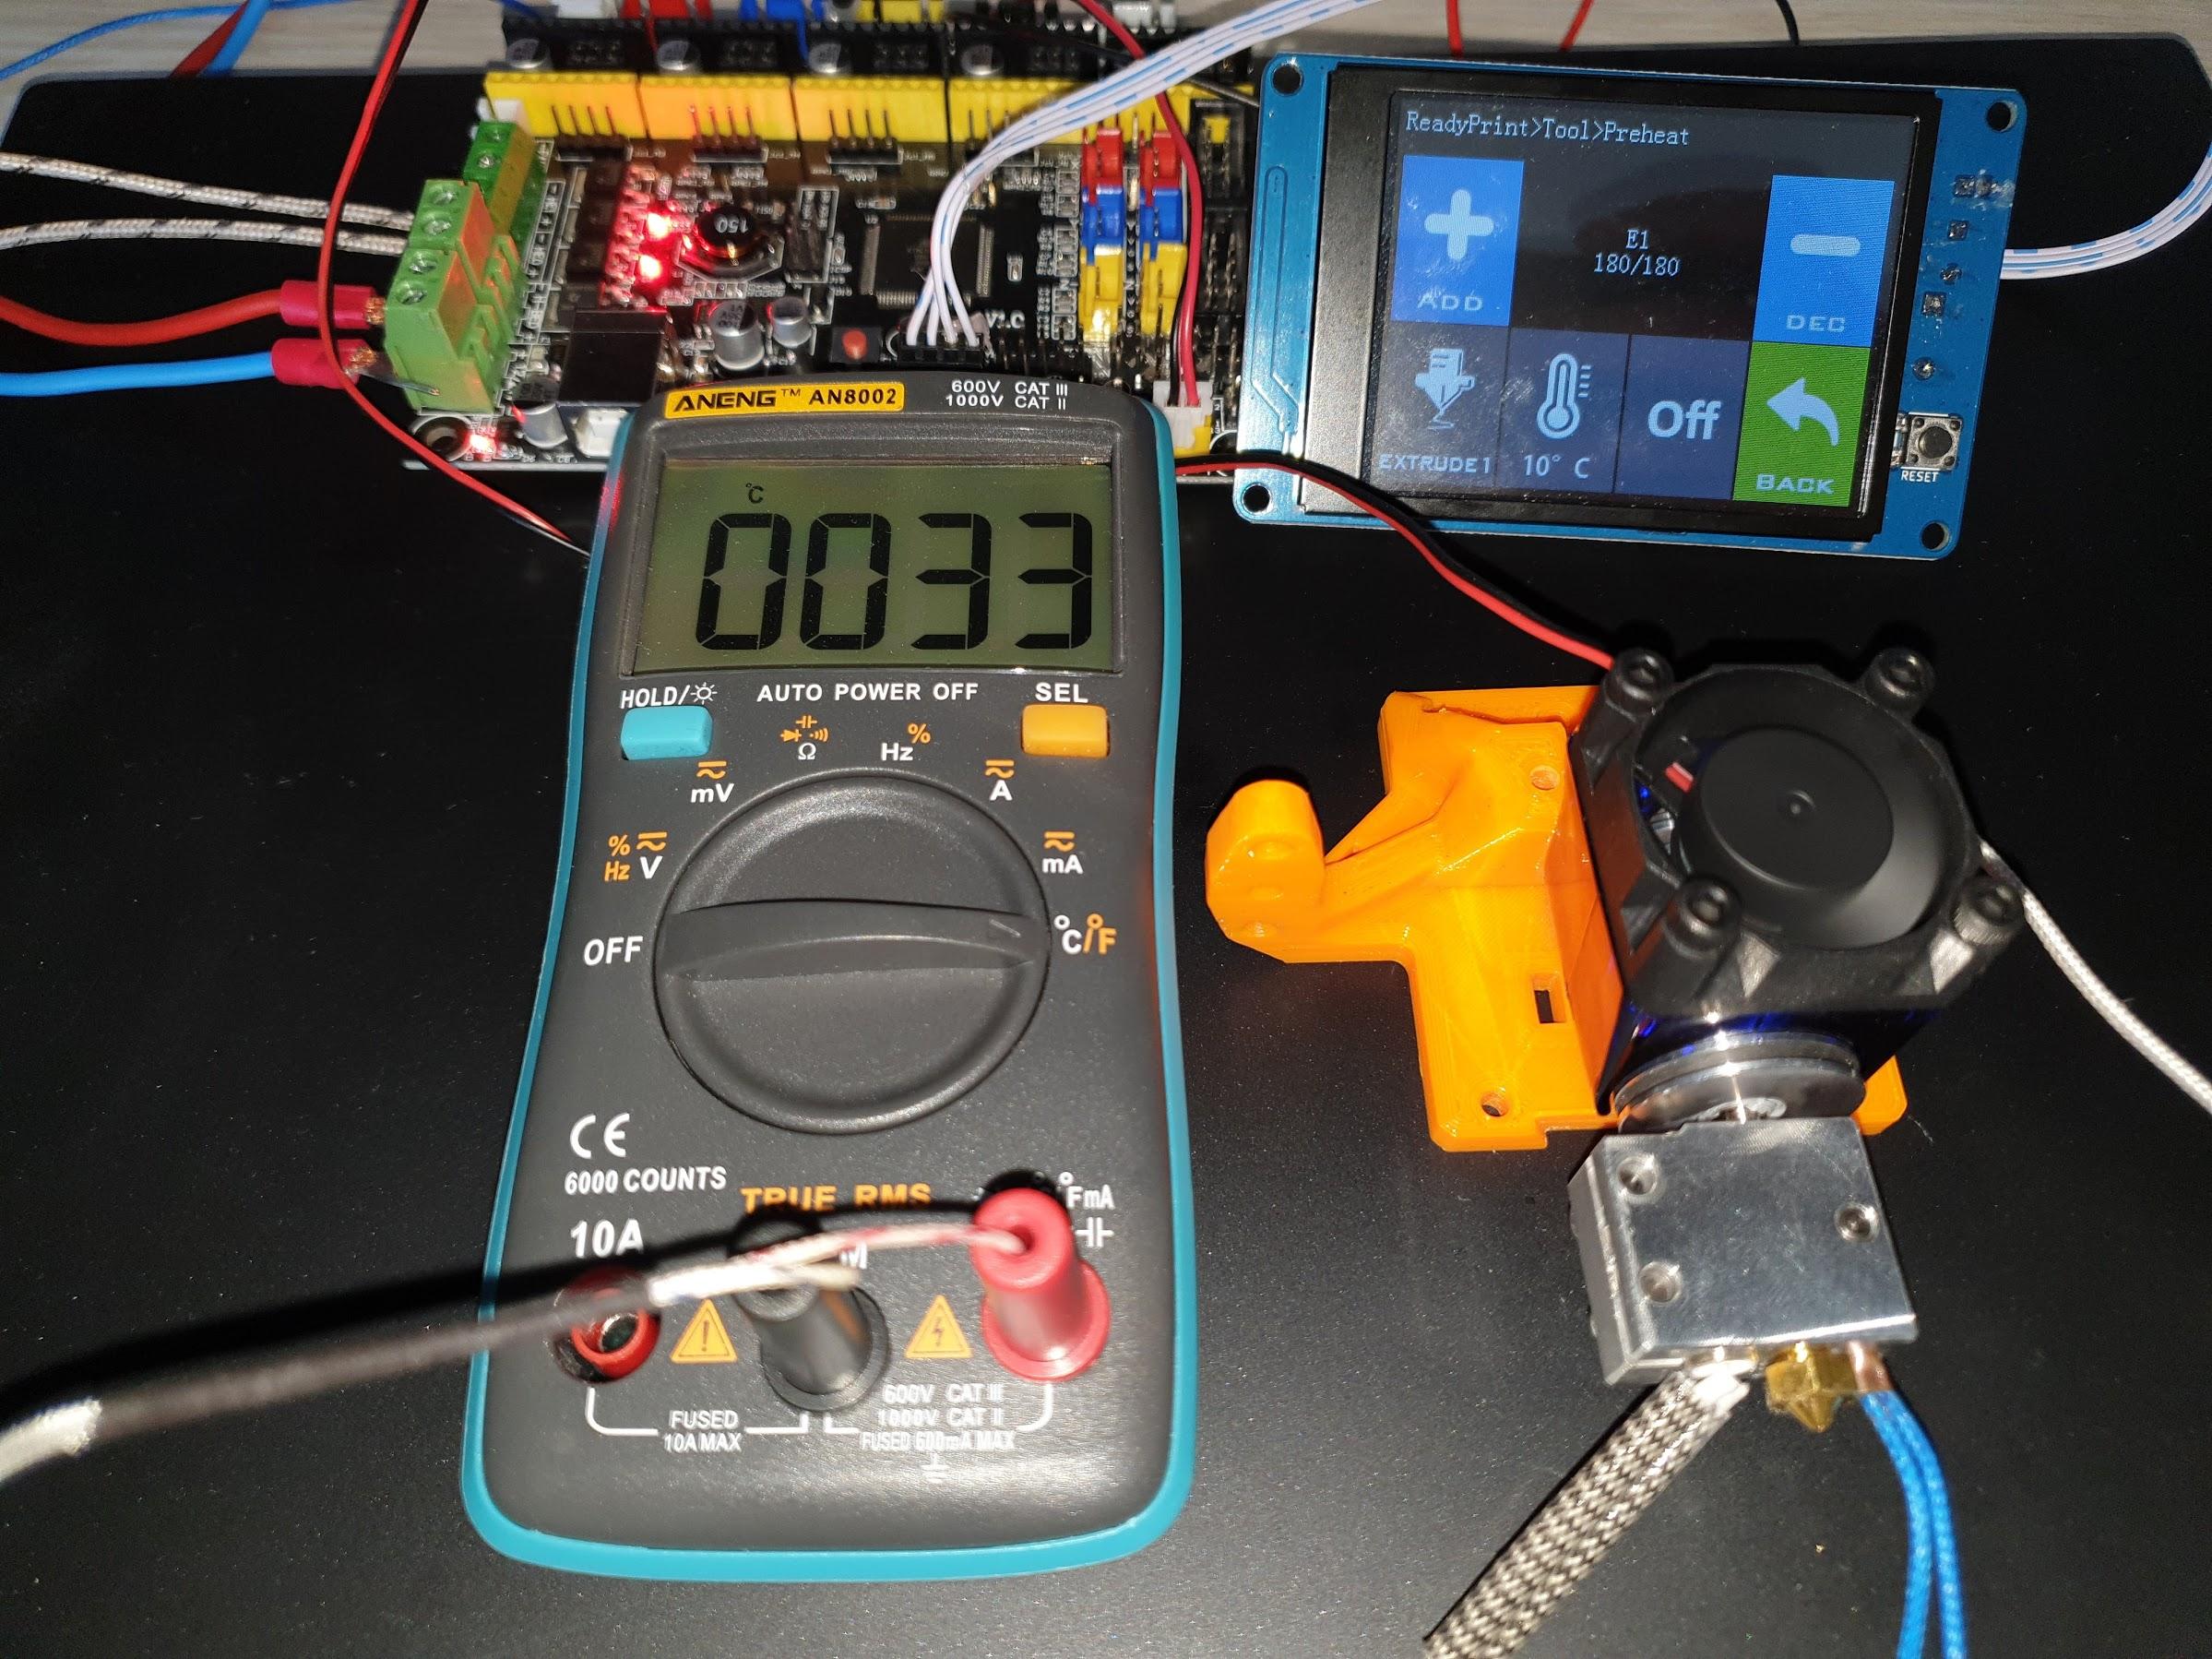 180C Regular Metal V6 Heatsink 10 minutes 33C